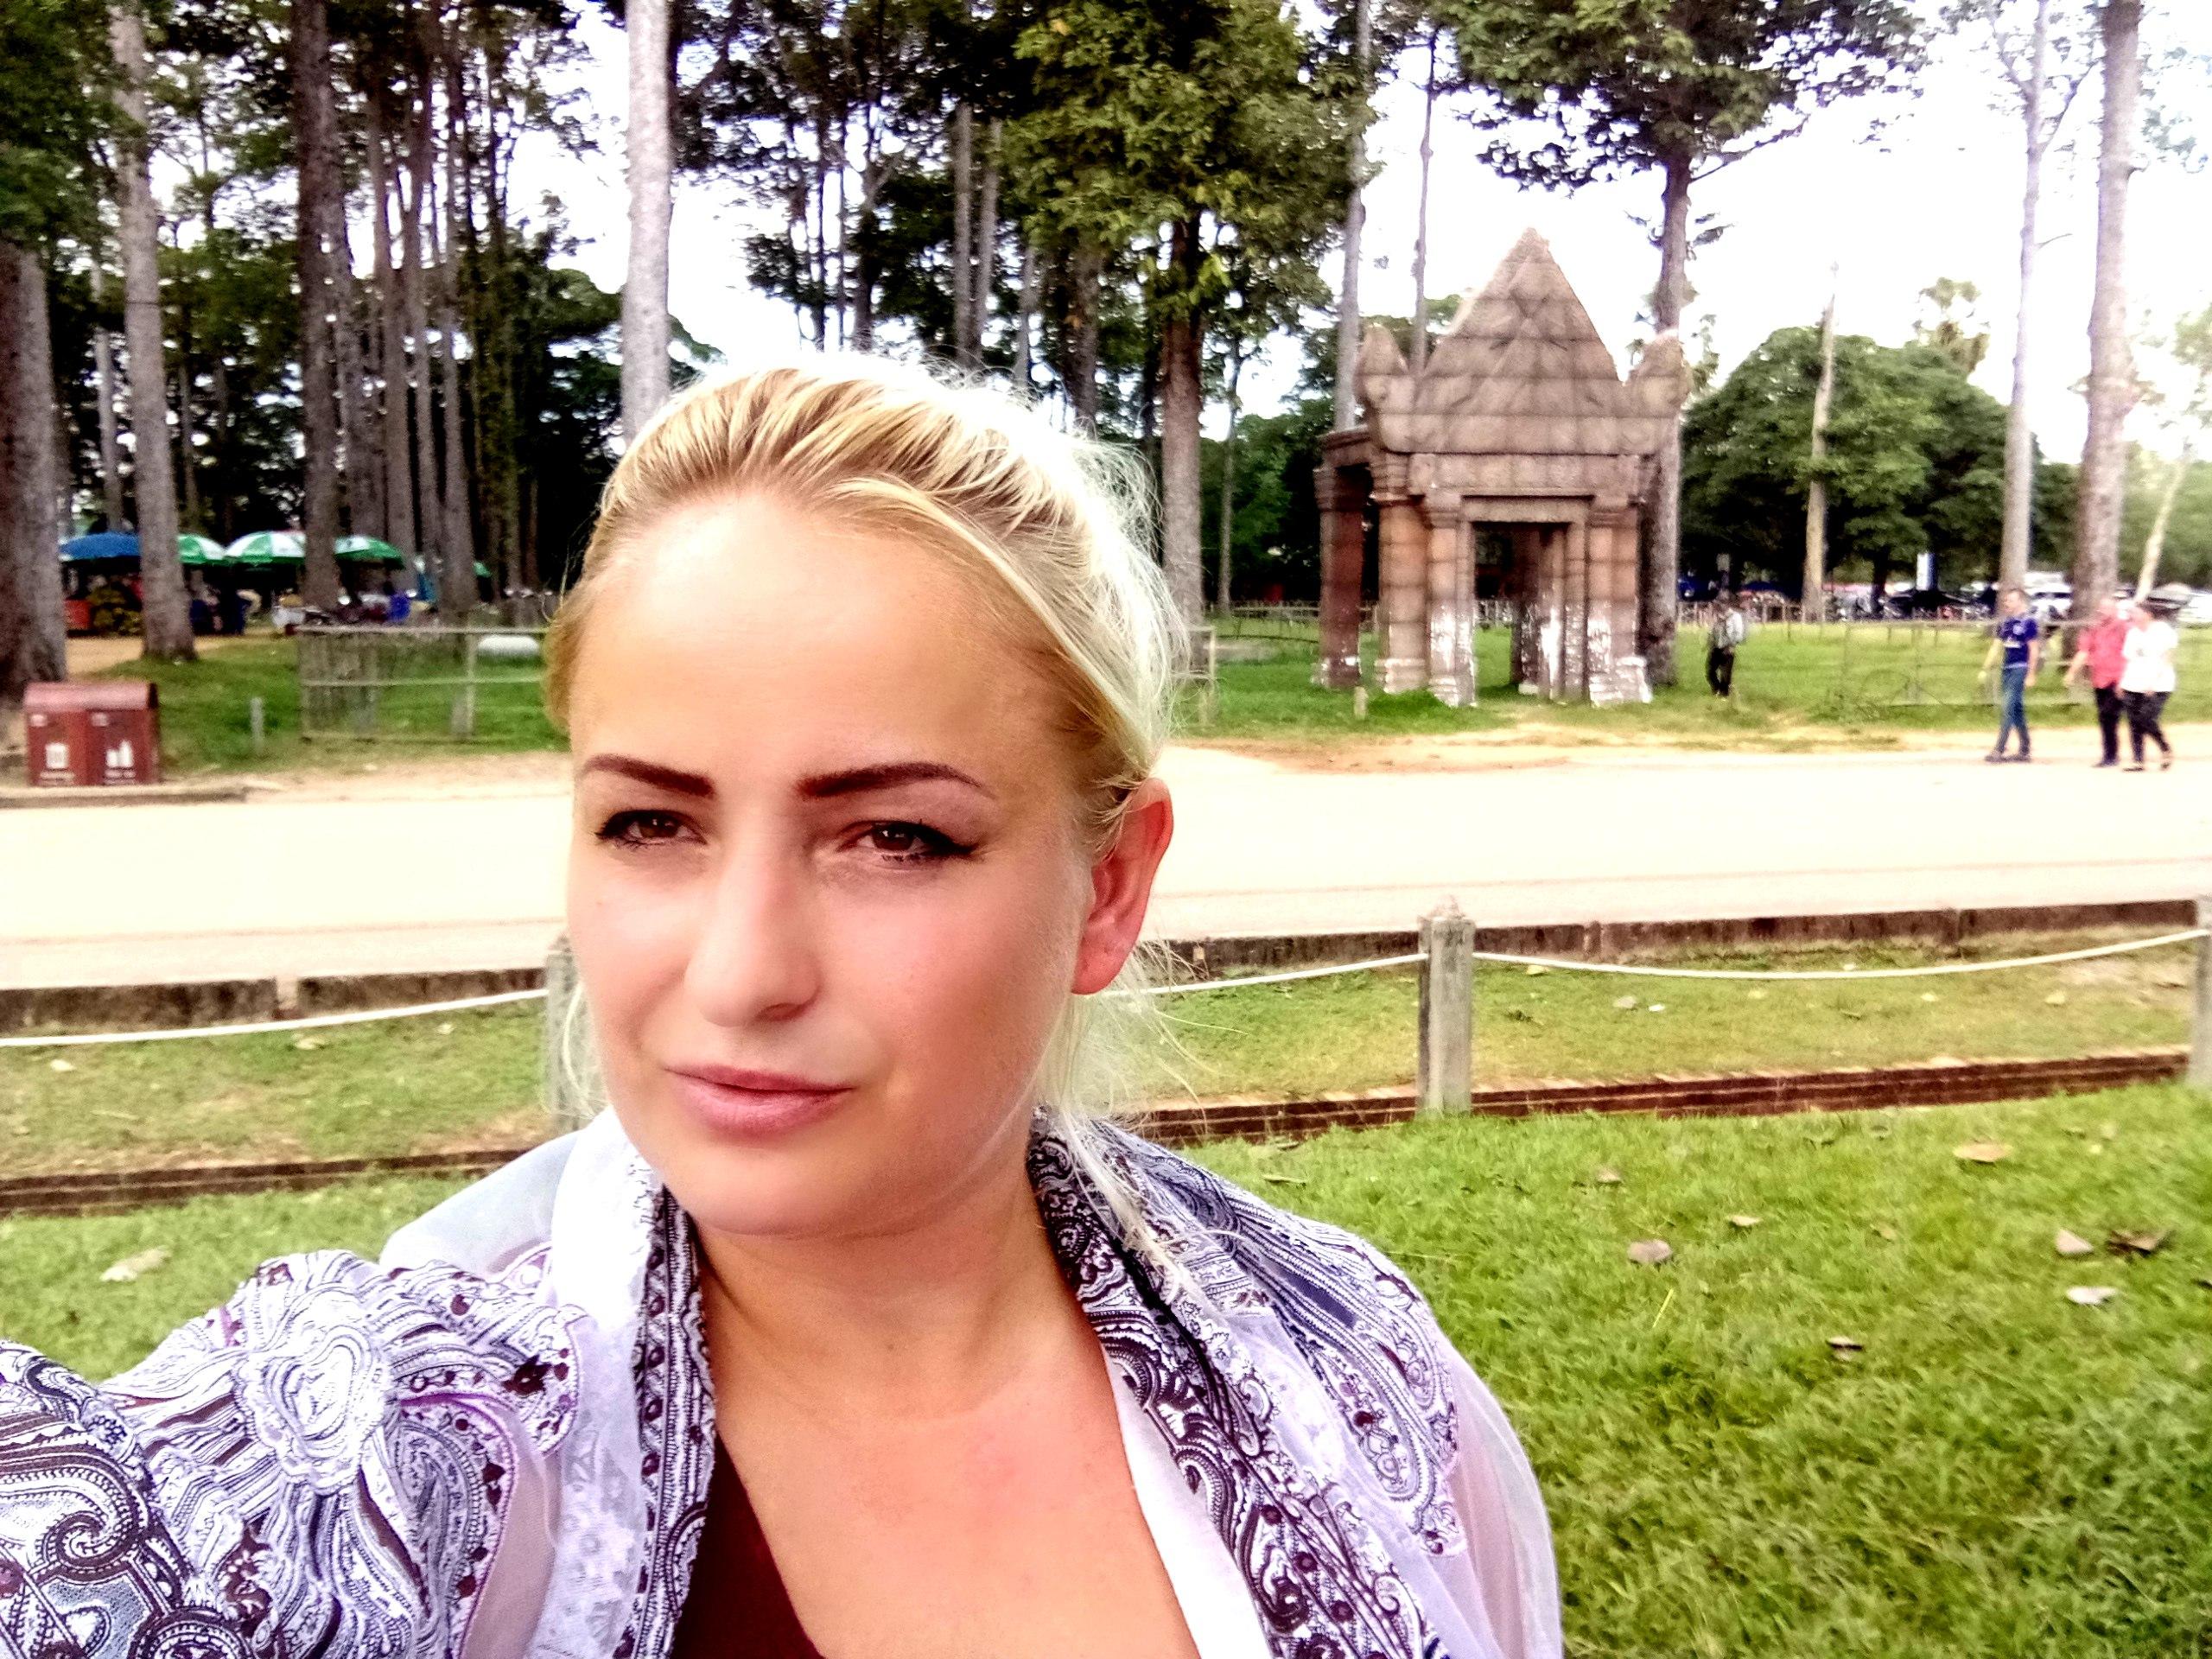 Елена Руденко (Валтея). Камбоджа. Ангкор. - Страница 4 Q4Pt6P5wtkA